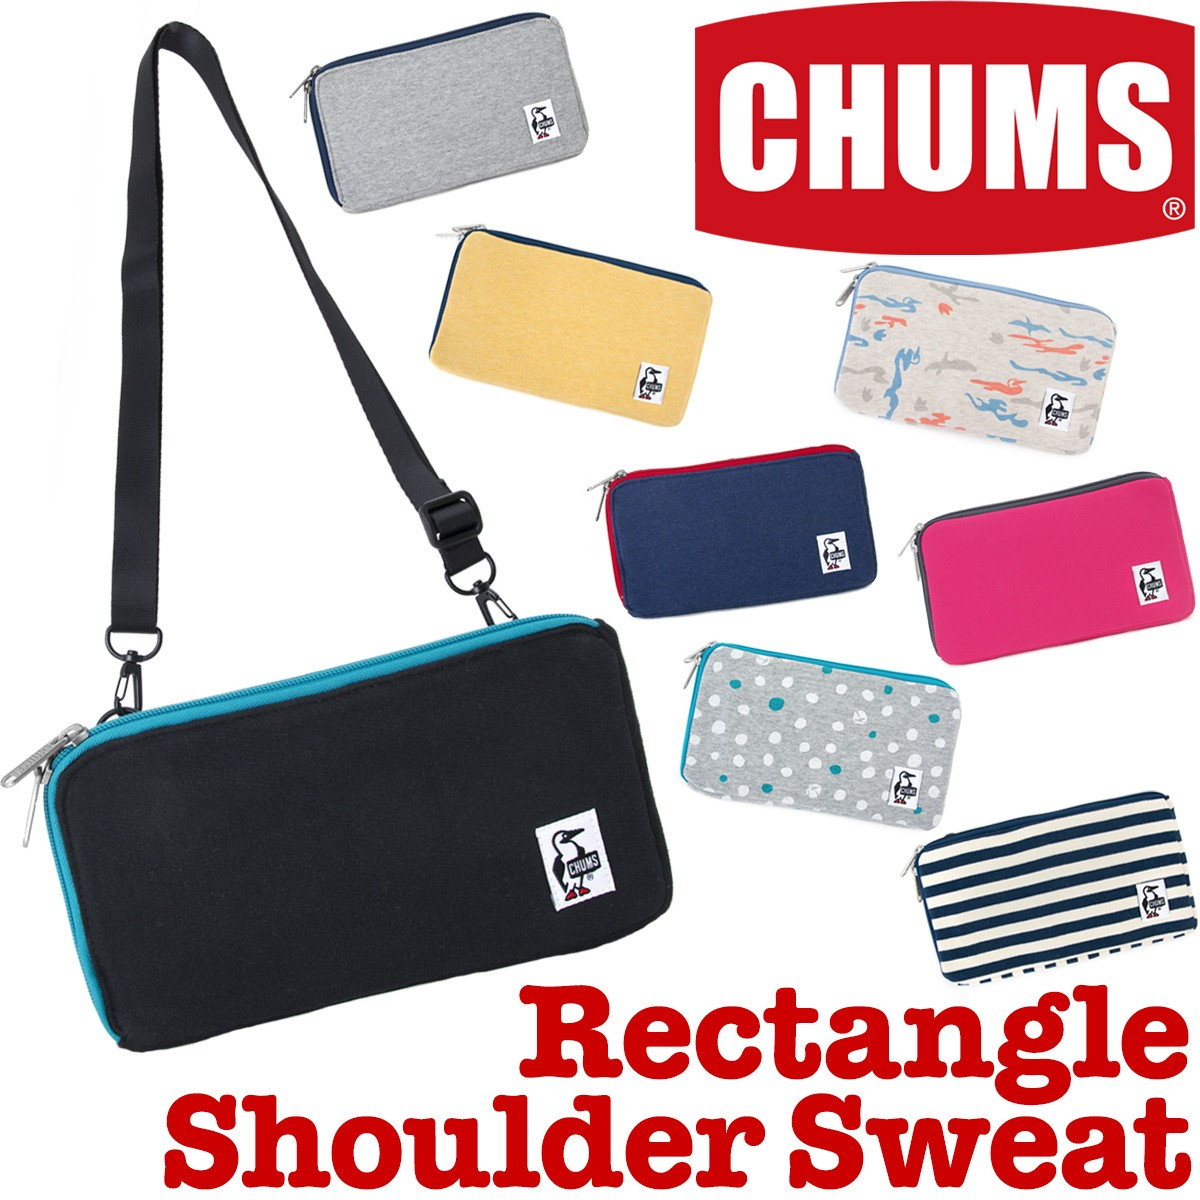 CHUMS Rectangle Shoulder Sweat レクタングル ショルダー スウェット